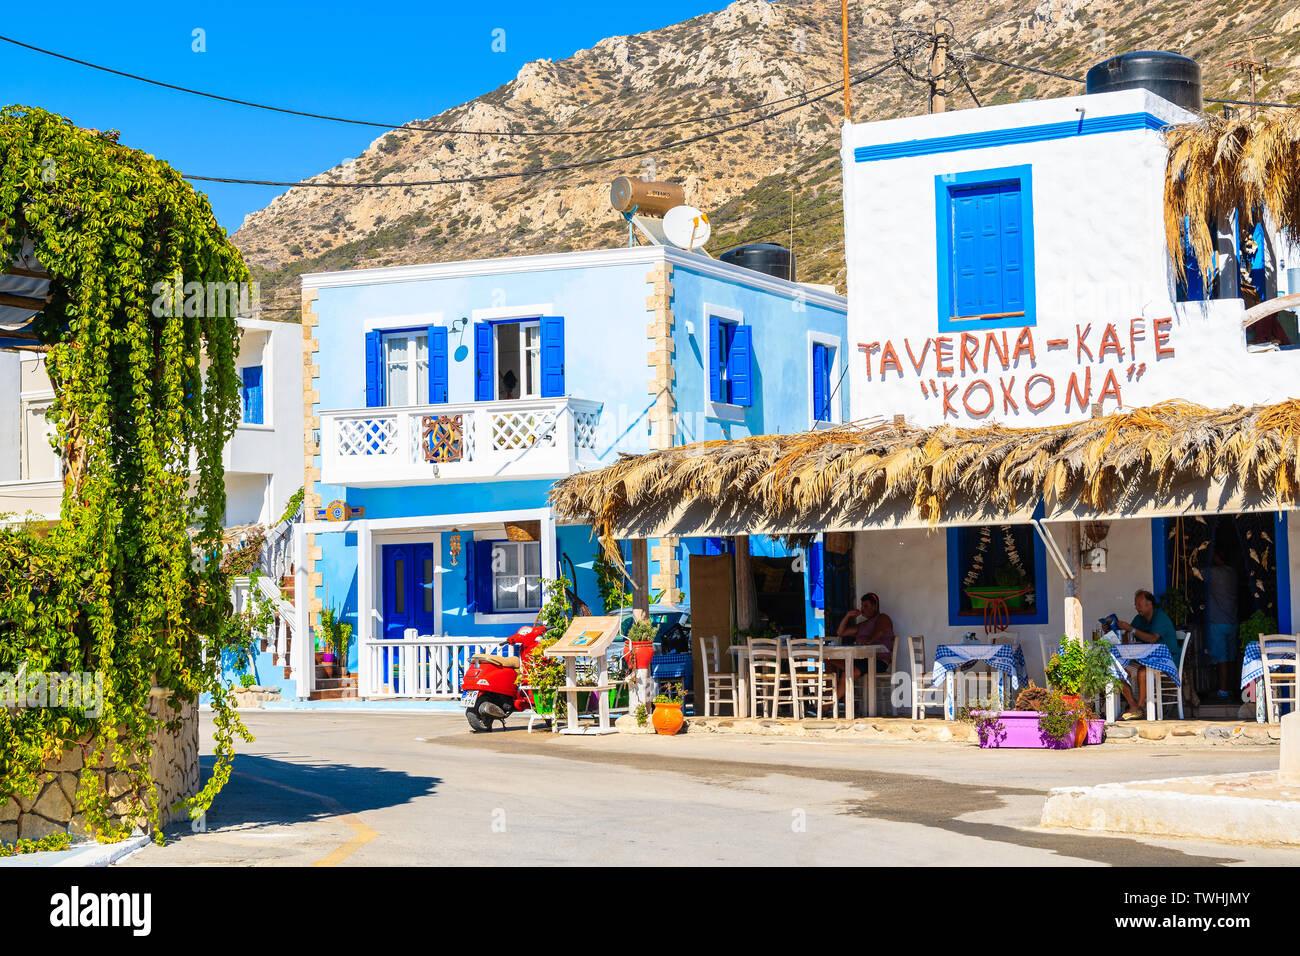 FINIKI PORT, KARPATHOS ISLAND - SEP 25, 2018: Typical Greek tavern in Finiki port on Karpathos island. Greece is very popular holiday destination in E Stock Photo